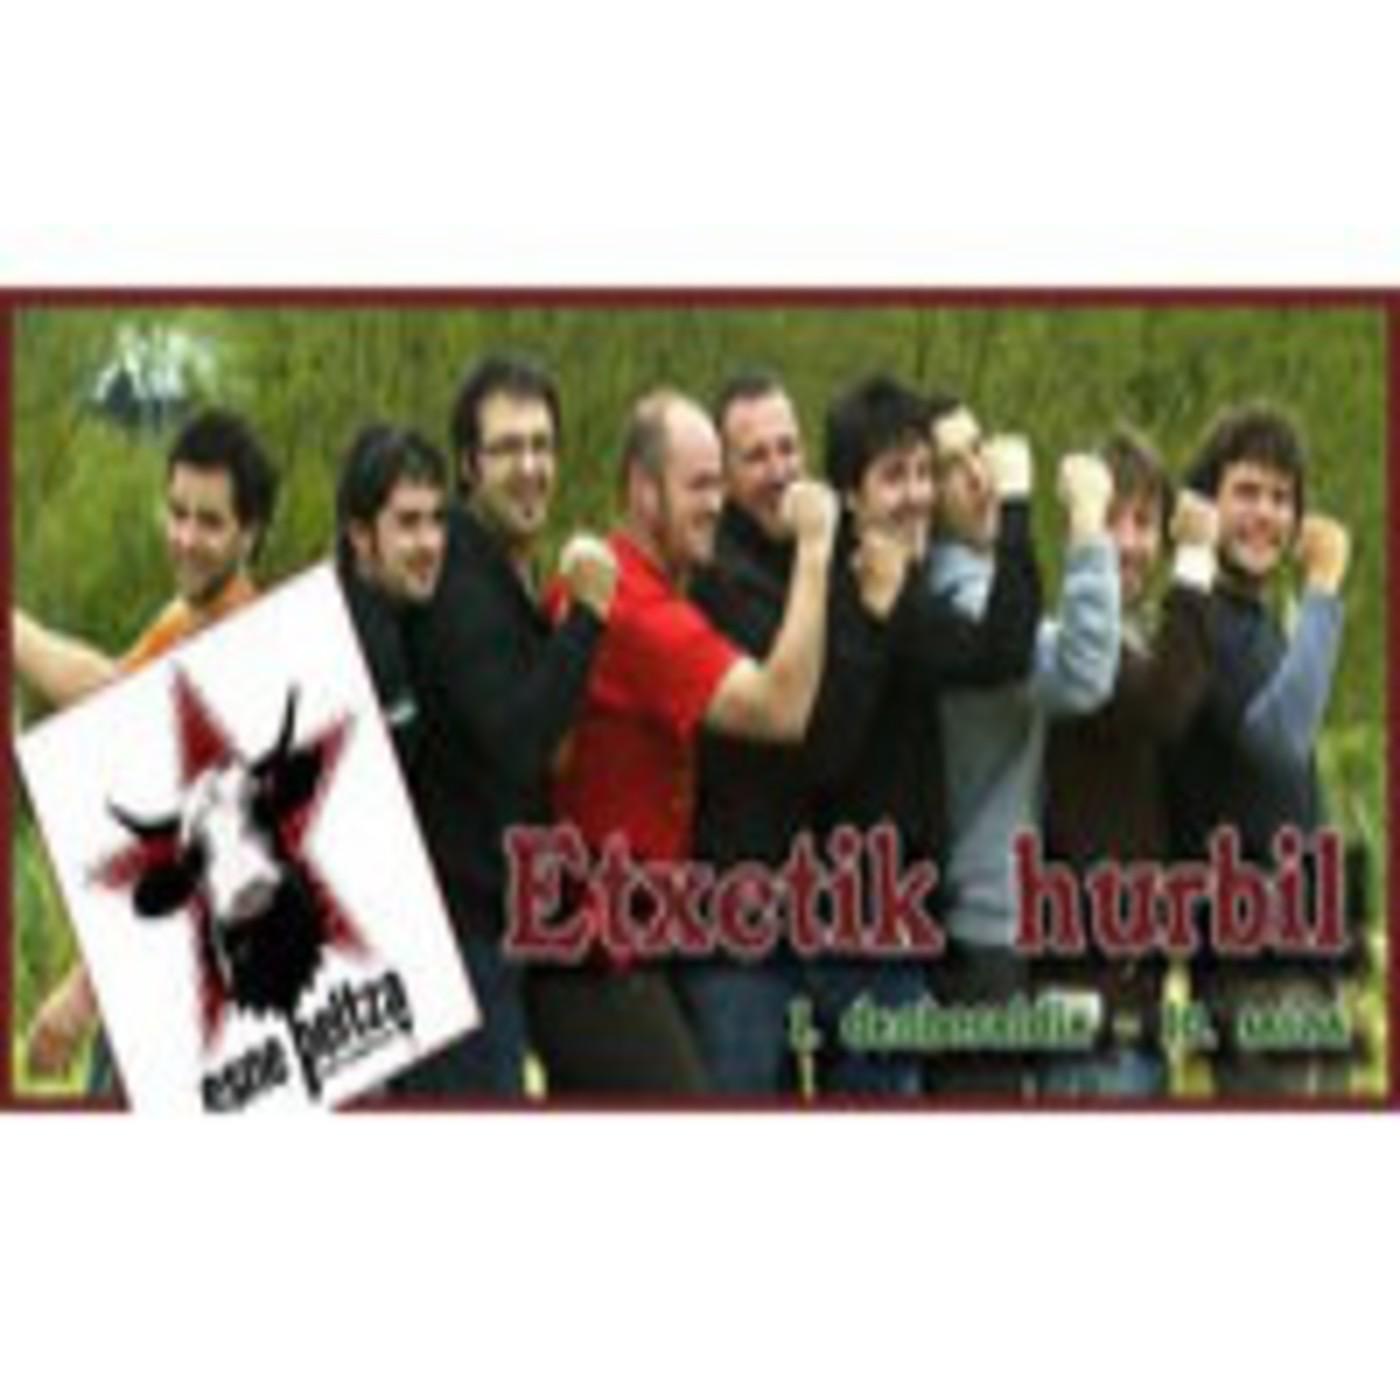 Esne Beltza Descargar Free Download